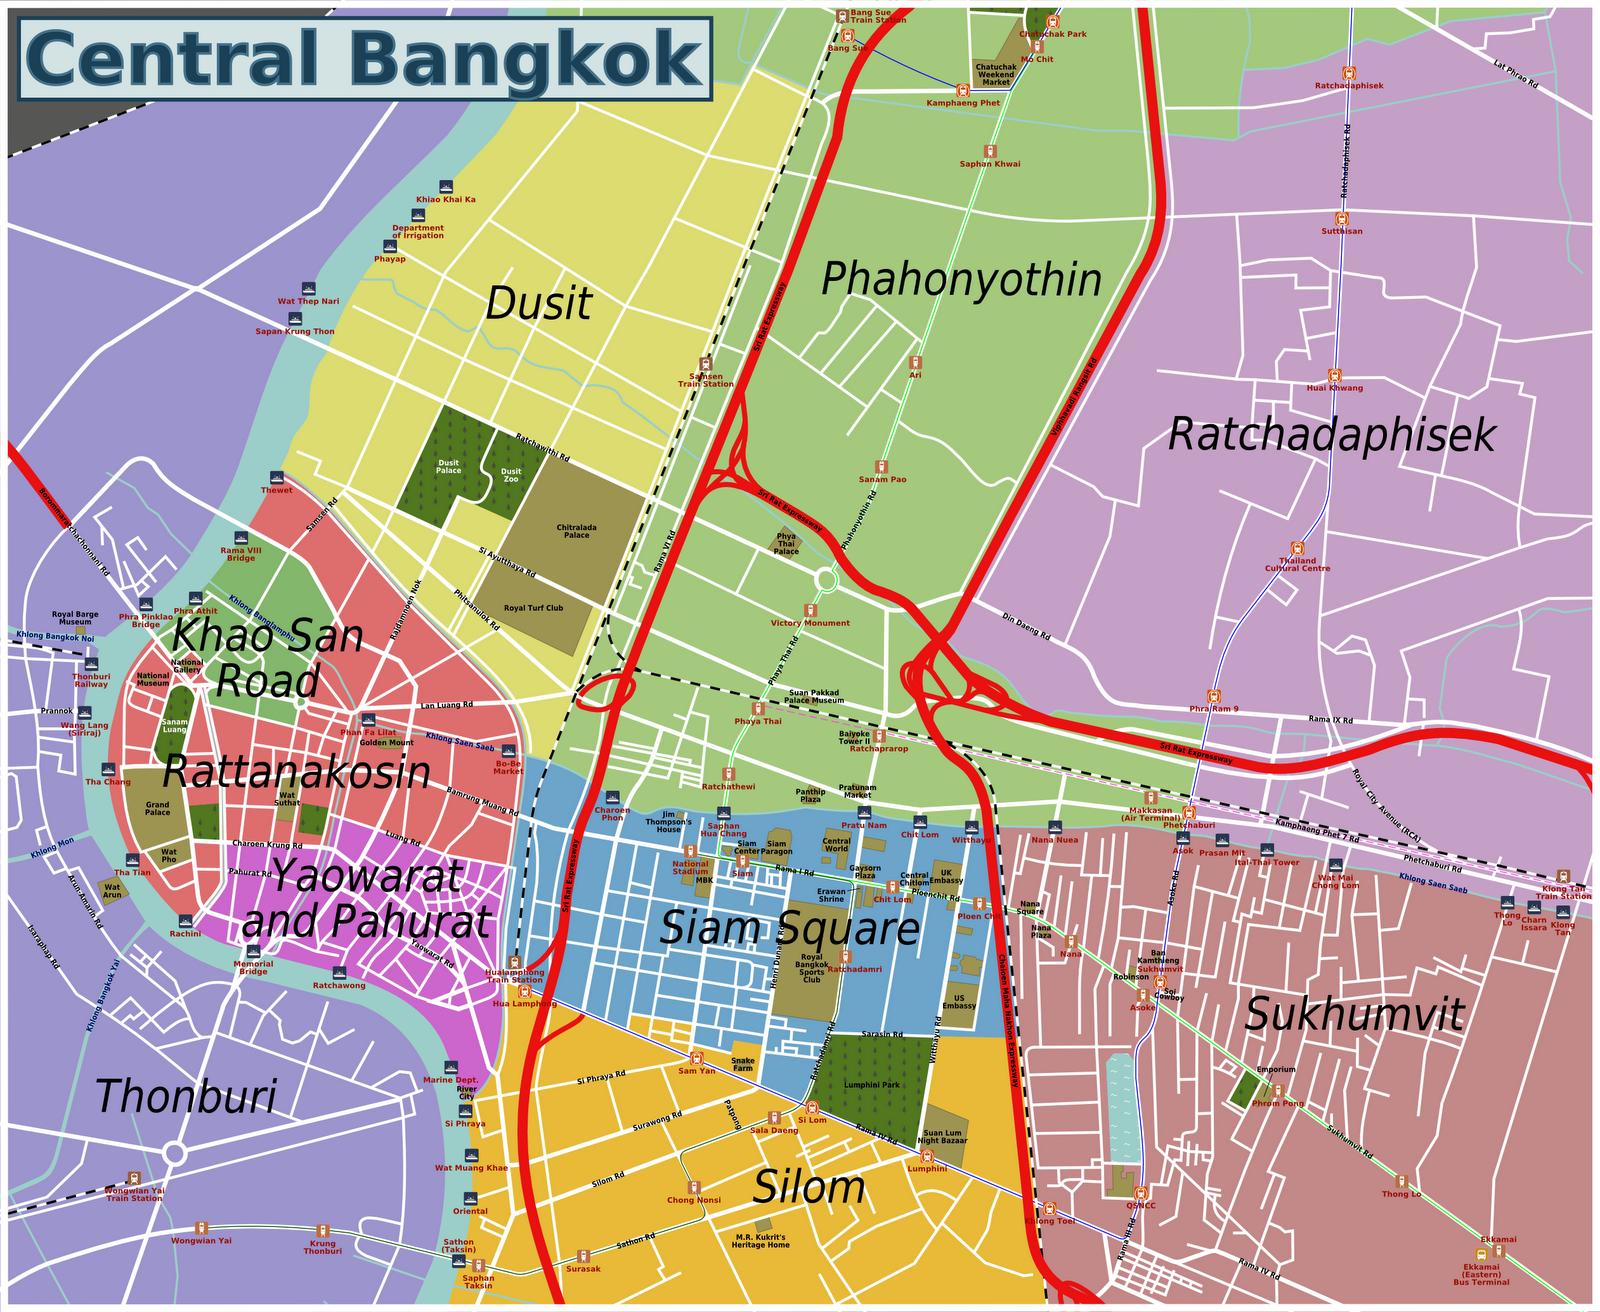 Bangkok Area Guide – Maps Of Bangkok For Tourists